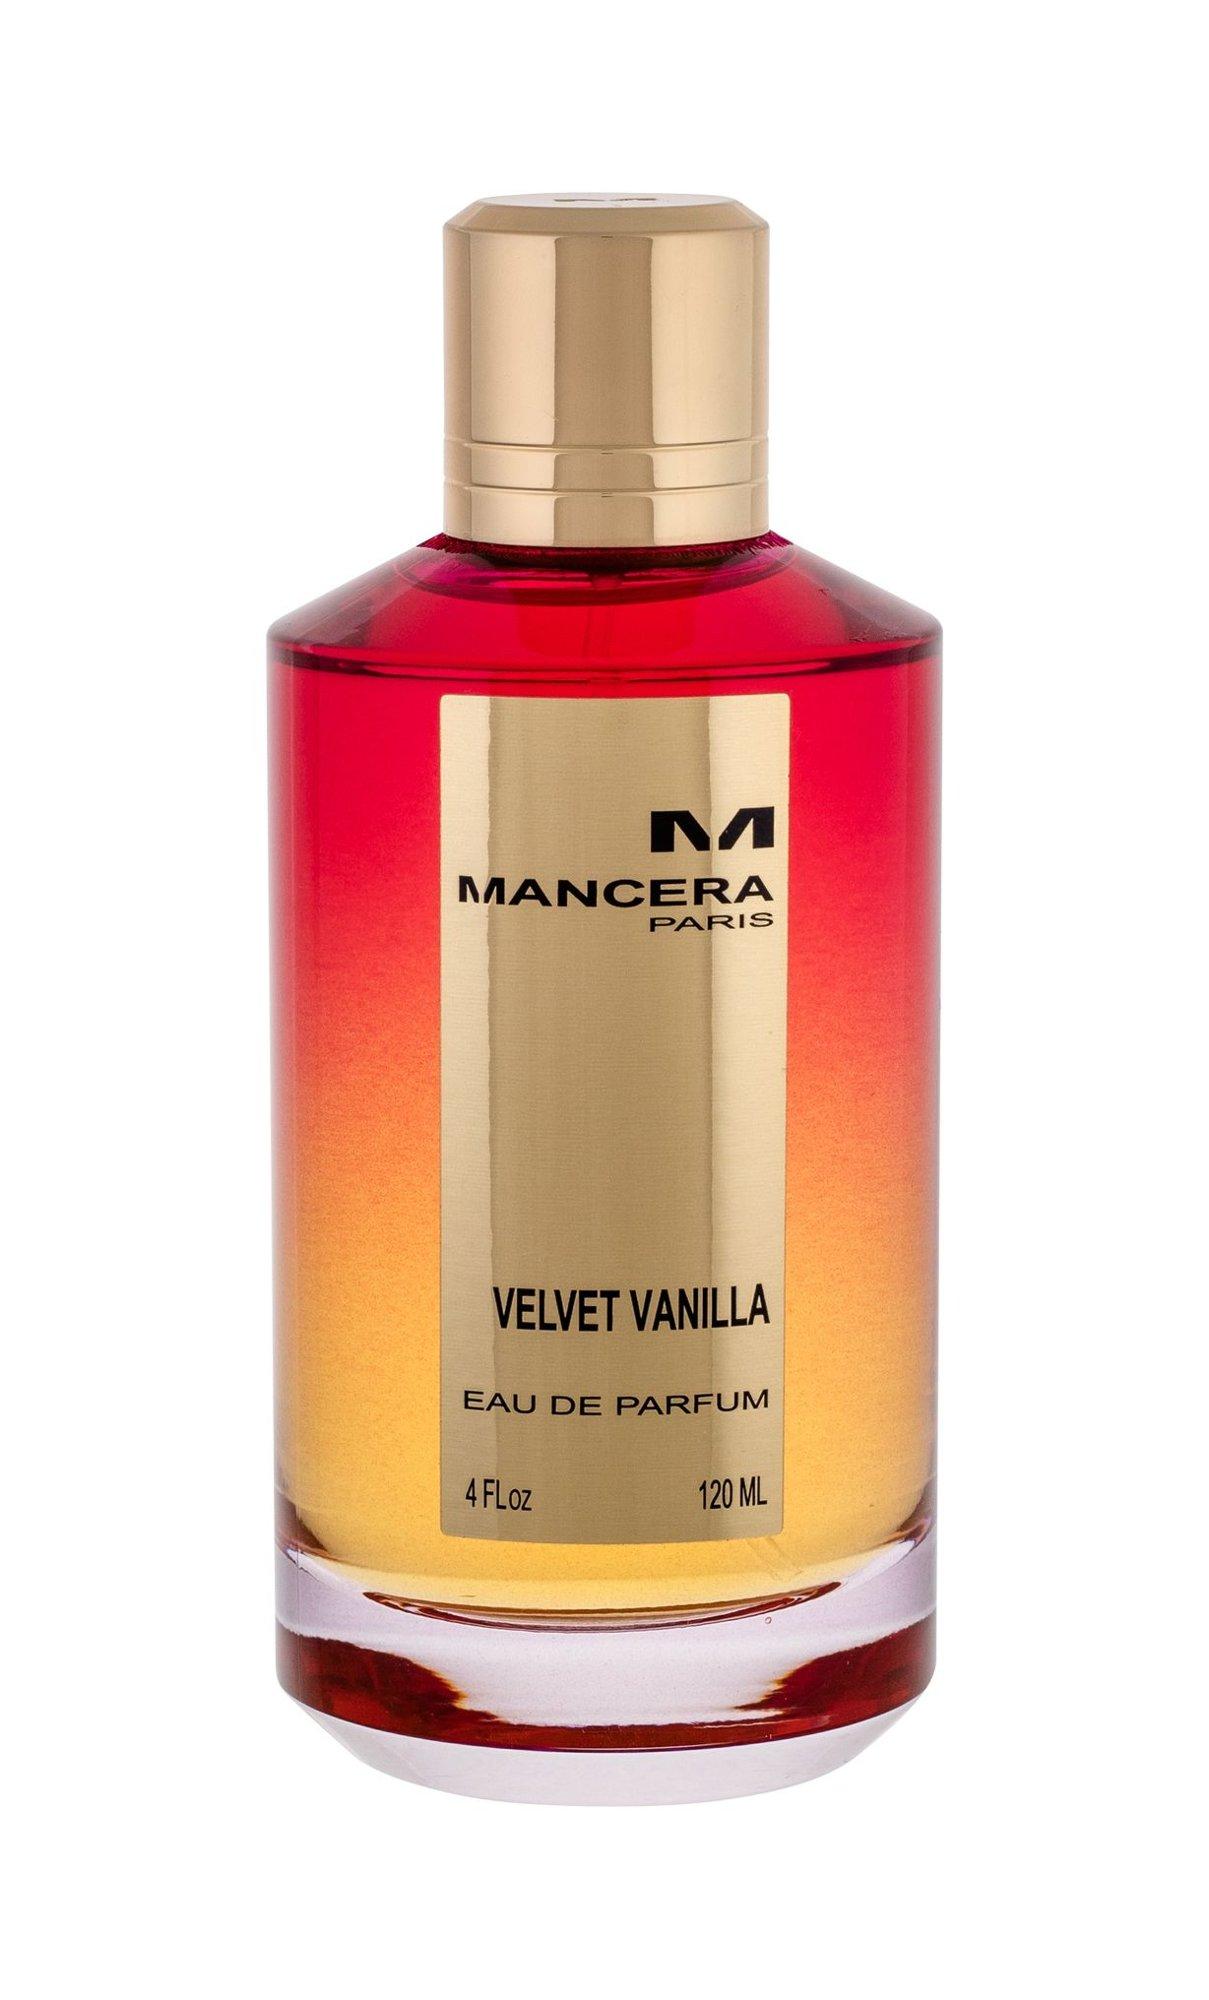 MANCERA Velvet Vanilla Eau de Parfum 120ml